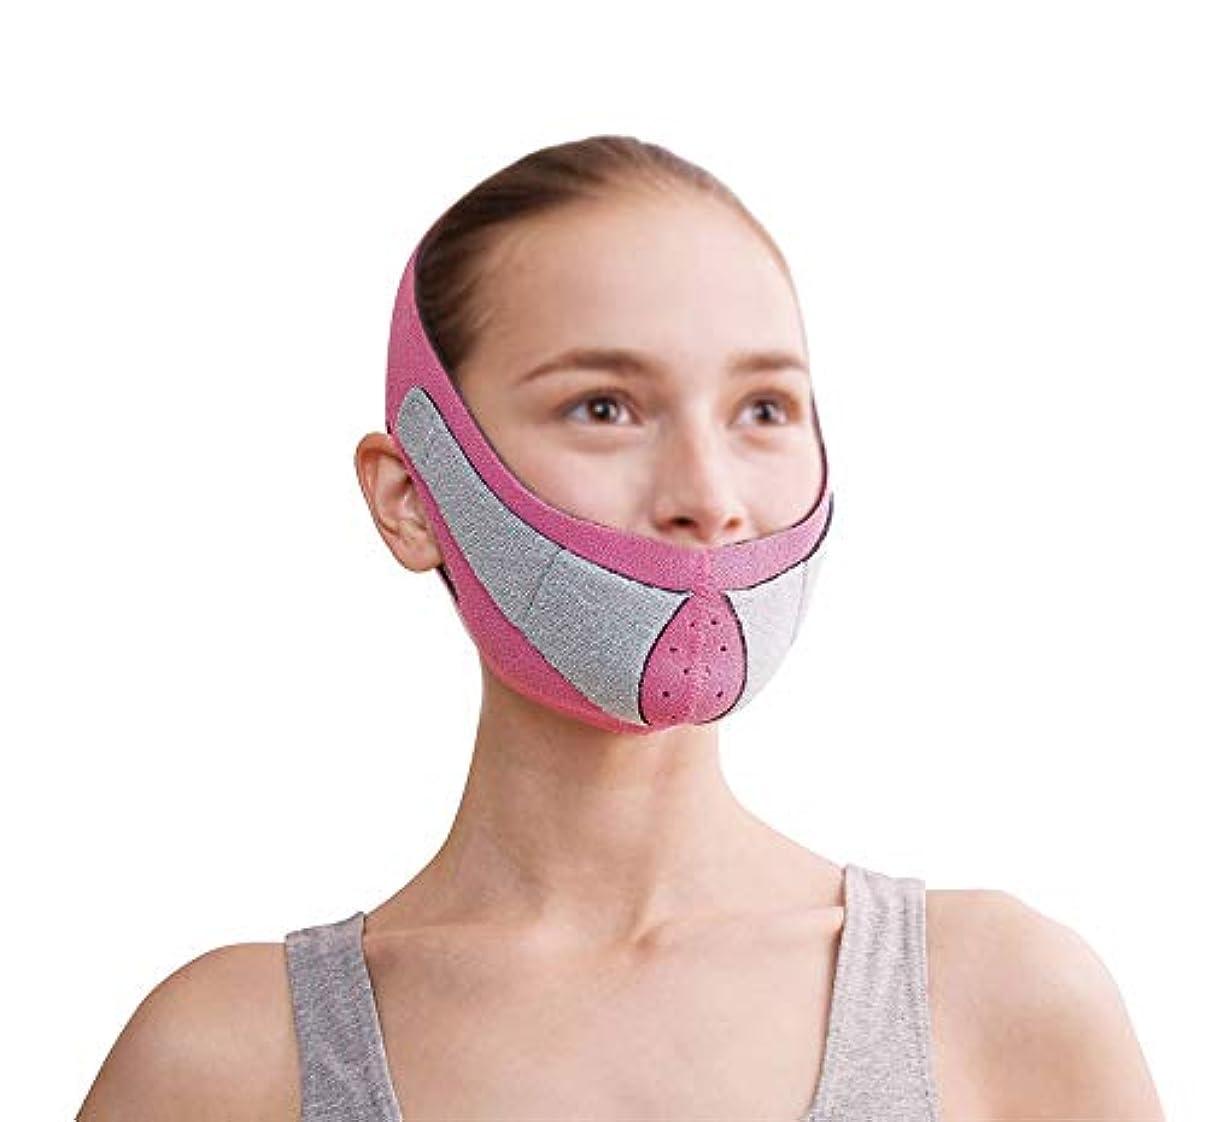 GLJJQMY 薄い顔のマスクのマスクと垂れ下がり防止の薄い顔のマスク薄い顔のマスクのアーティファクトの美しさの首ネックストラップを引き締め 顔用整形マスク